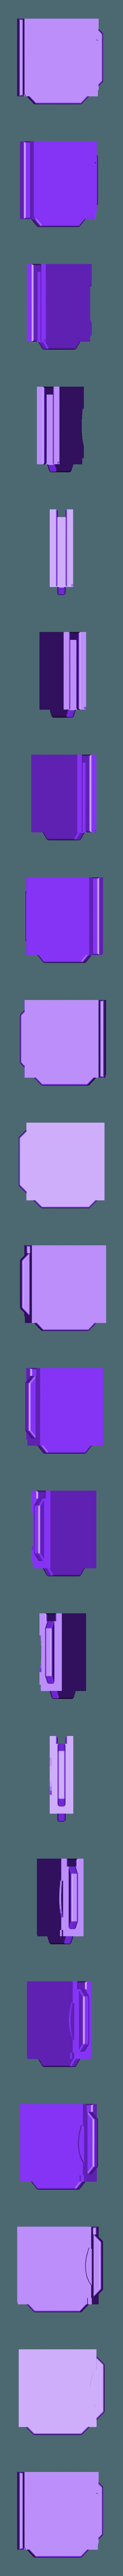 Piece - Part 23.stl Download free STL file Taquin CULTS / Sliding Puzzle • 3D print model, Valelab3D